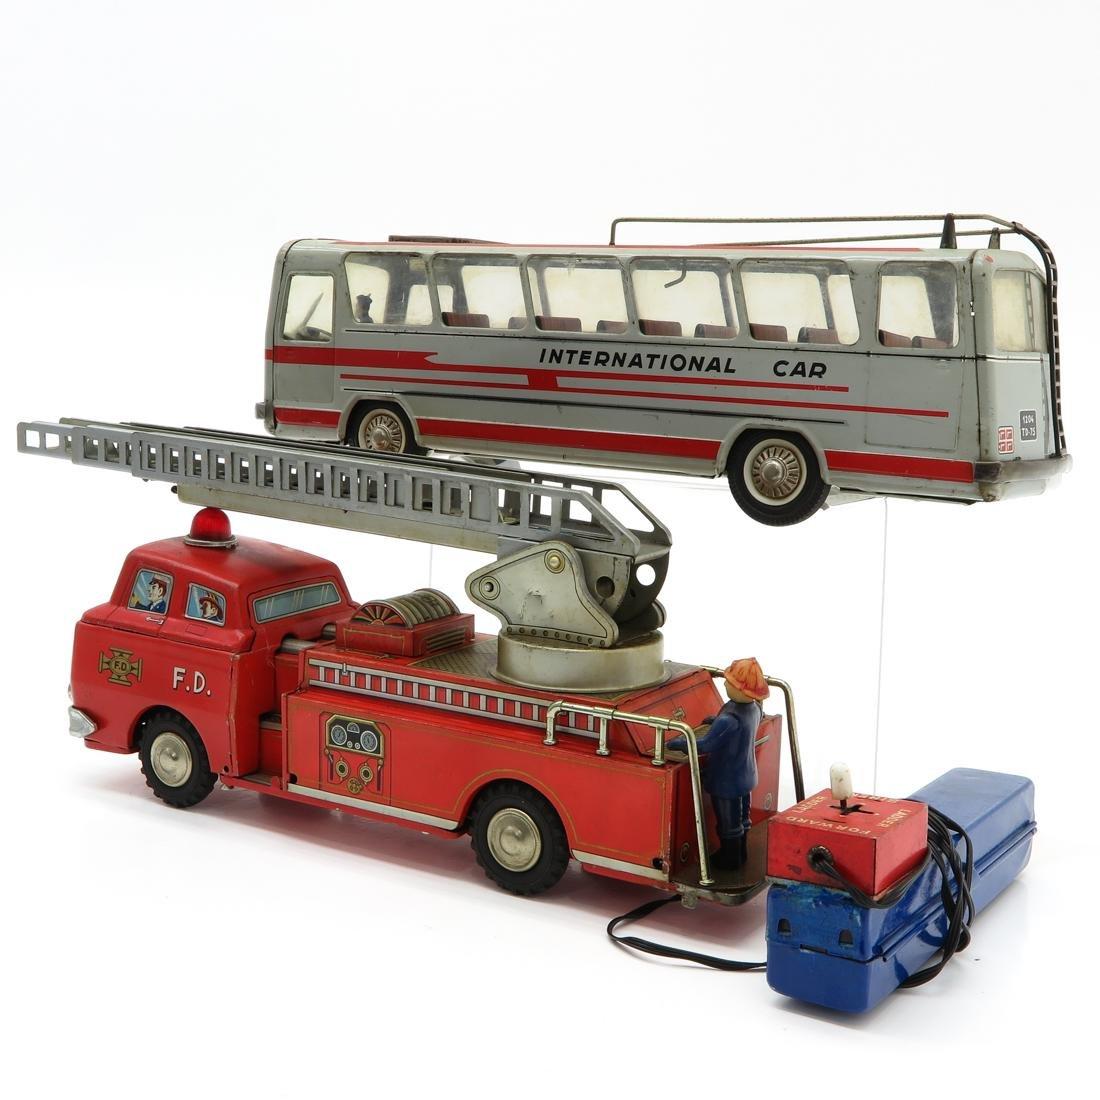 Lot of 2 Vintage Toys - 3